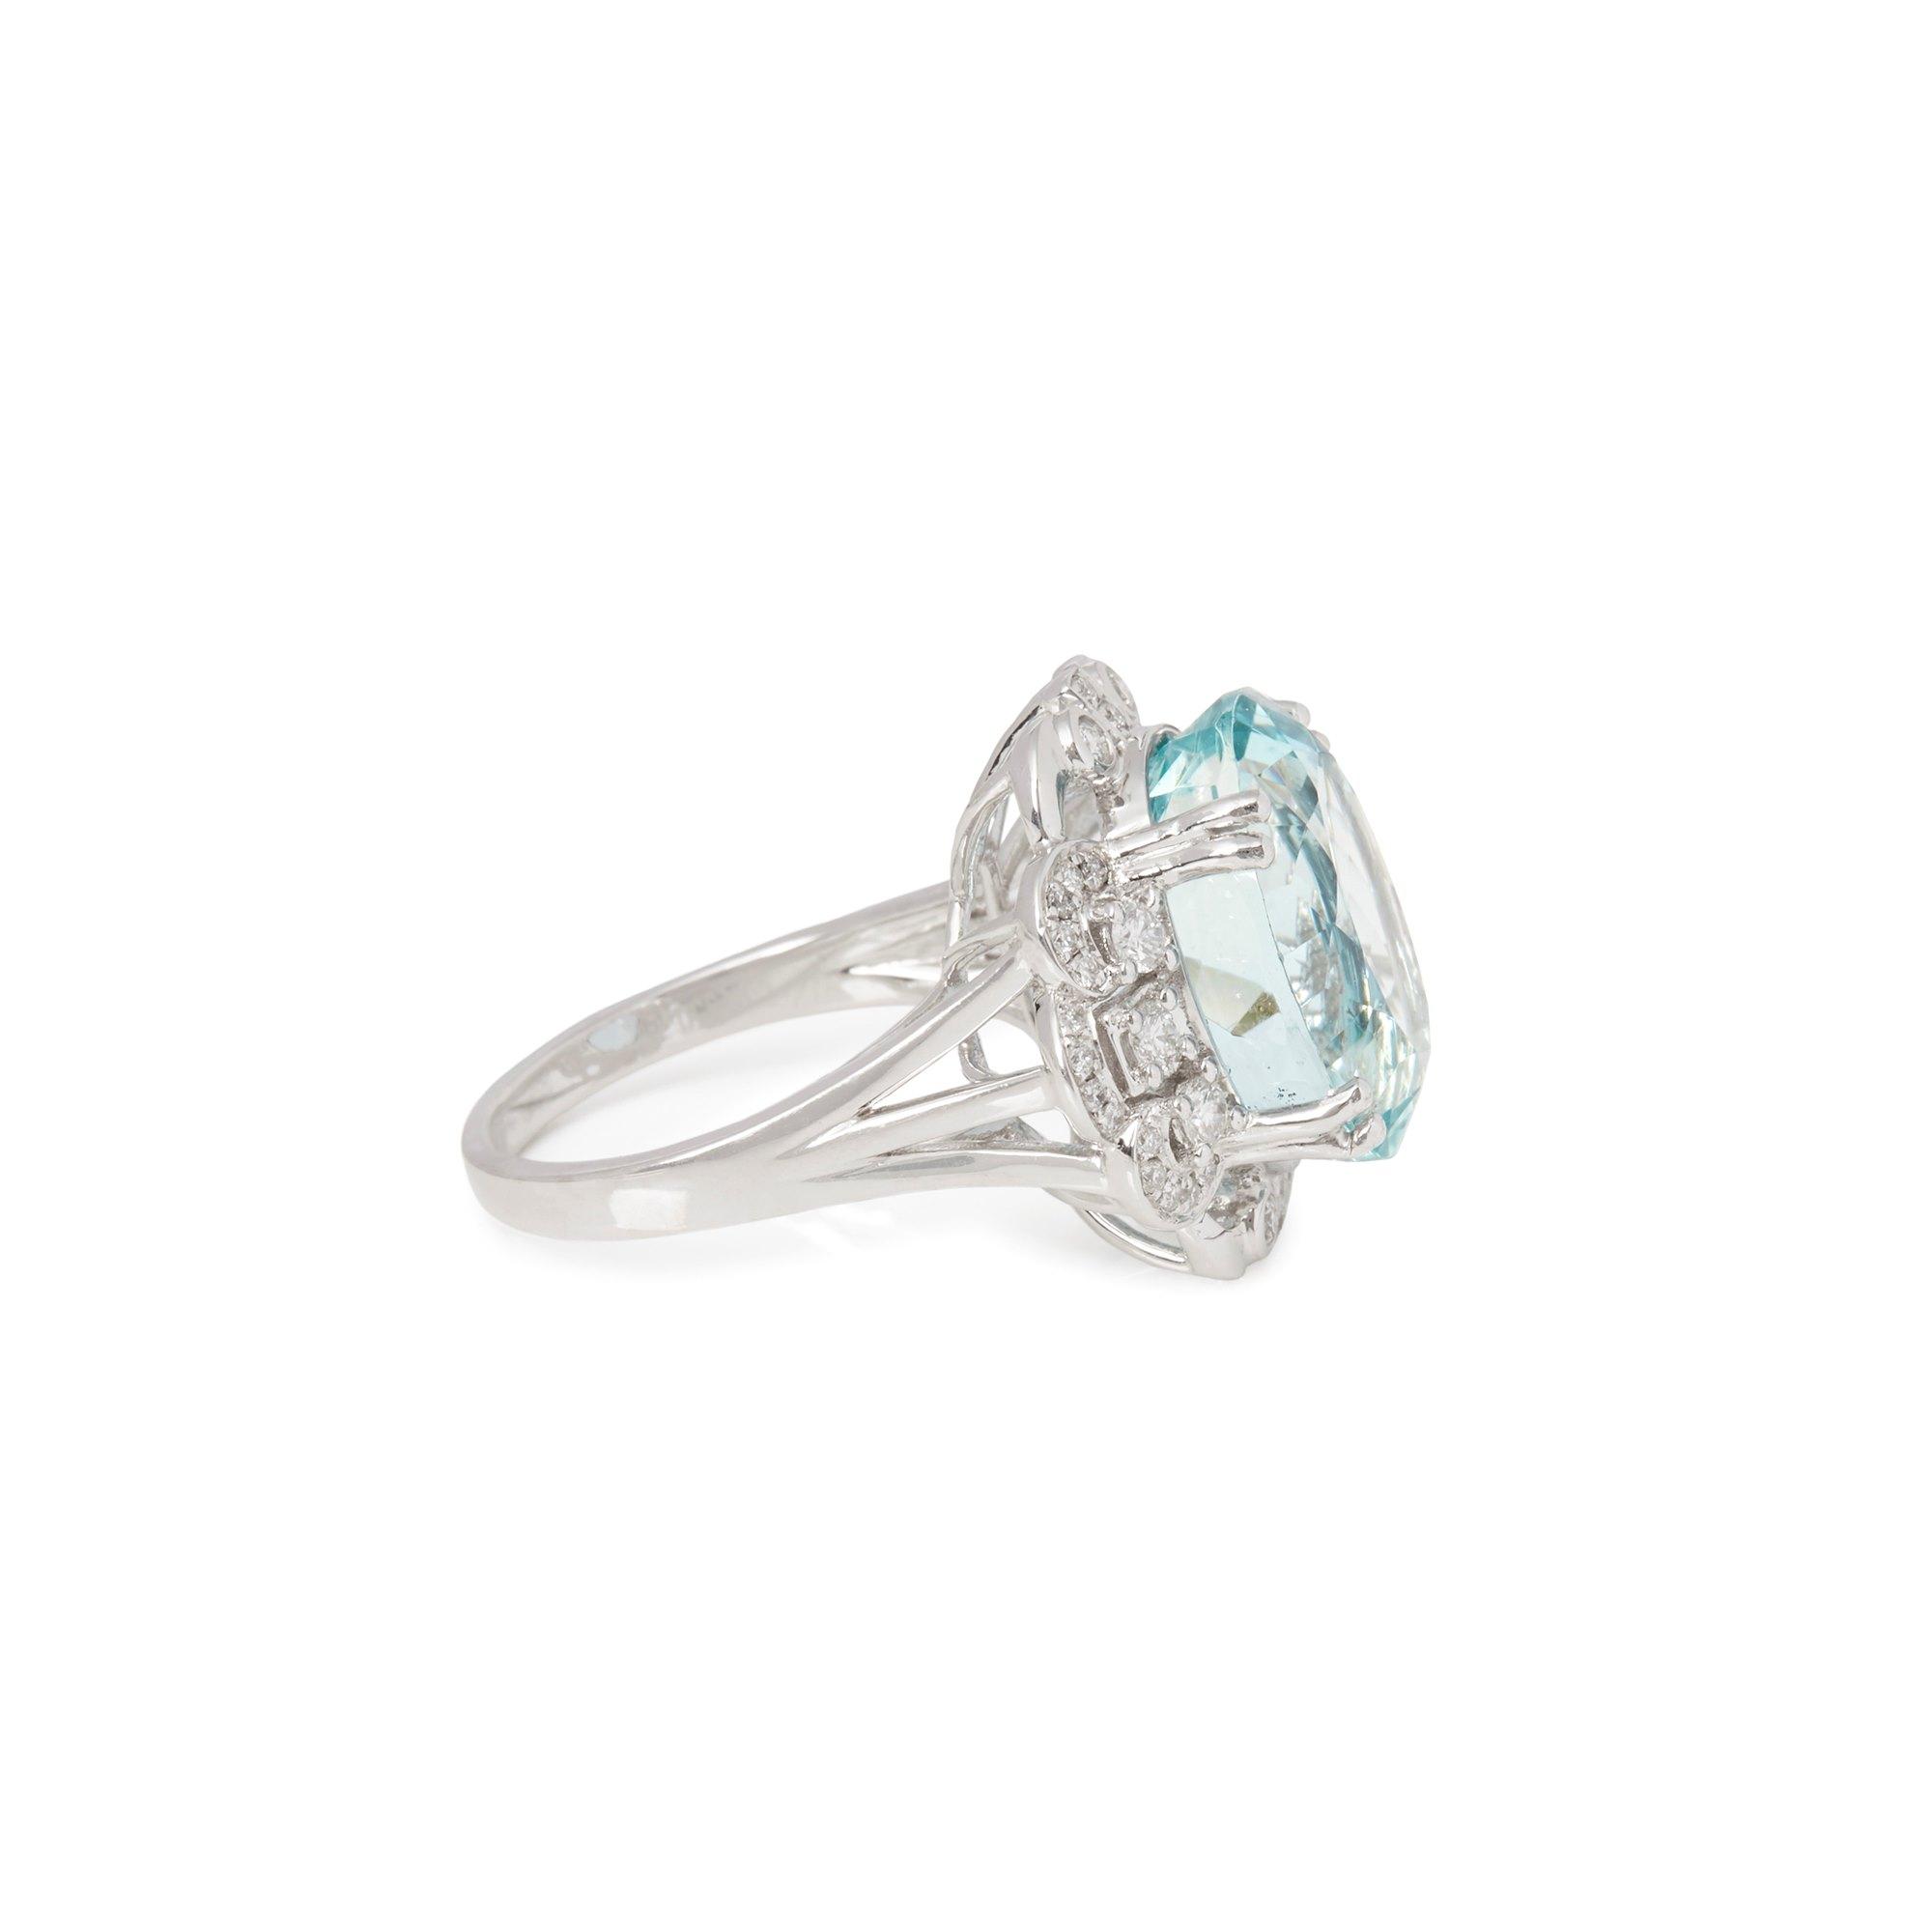 David Jerome Certified 12.93ct Unheated Brazilian Aquamarine and Diamond Platinum Ring